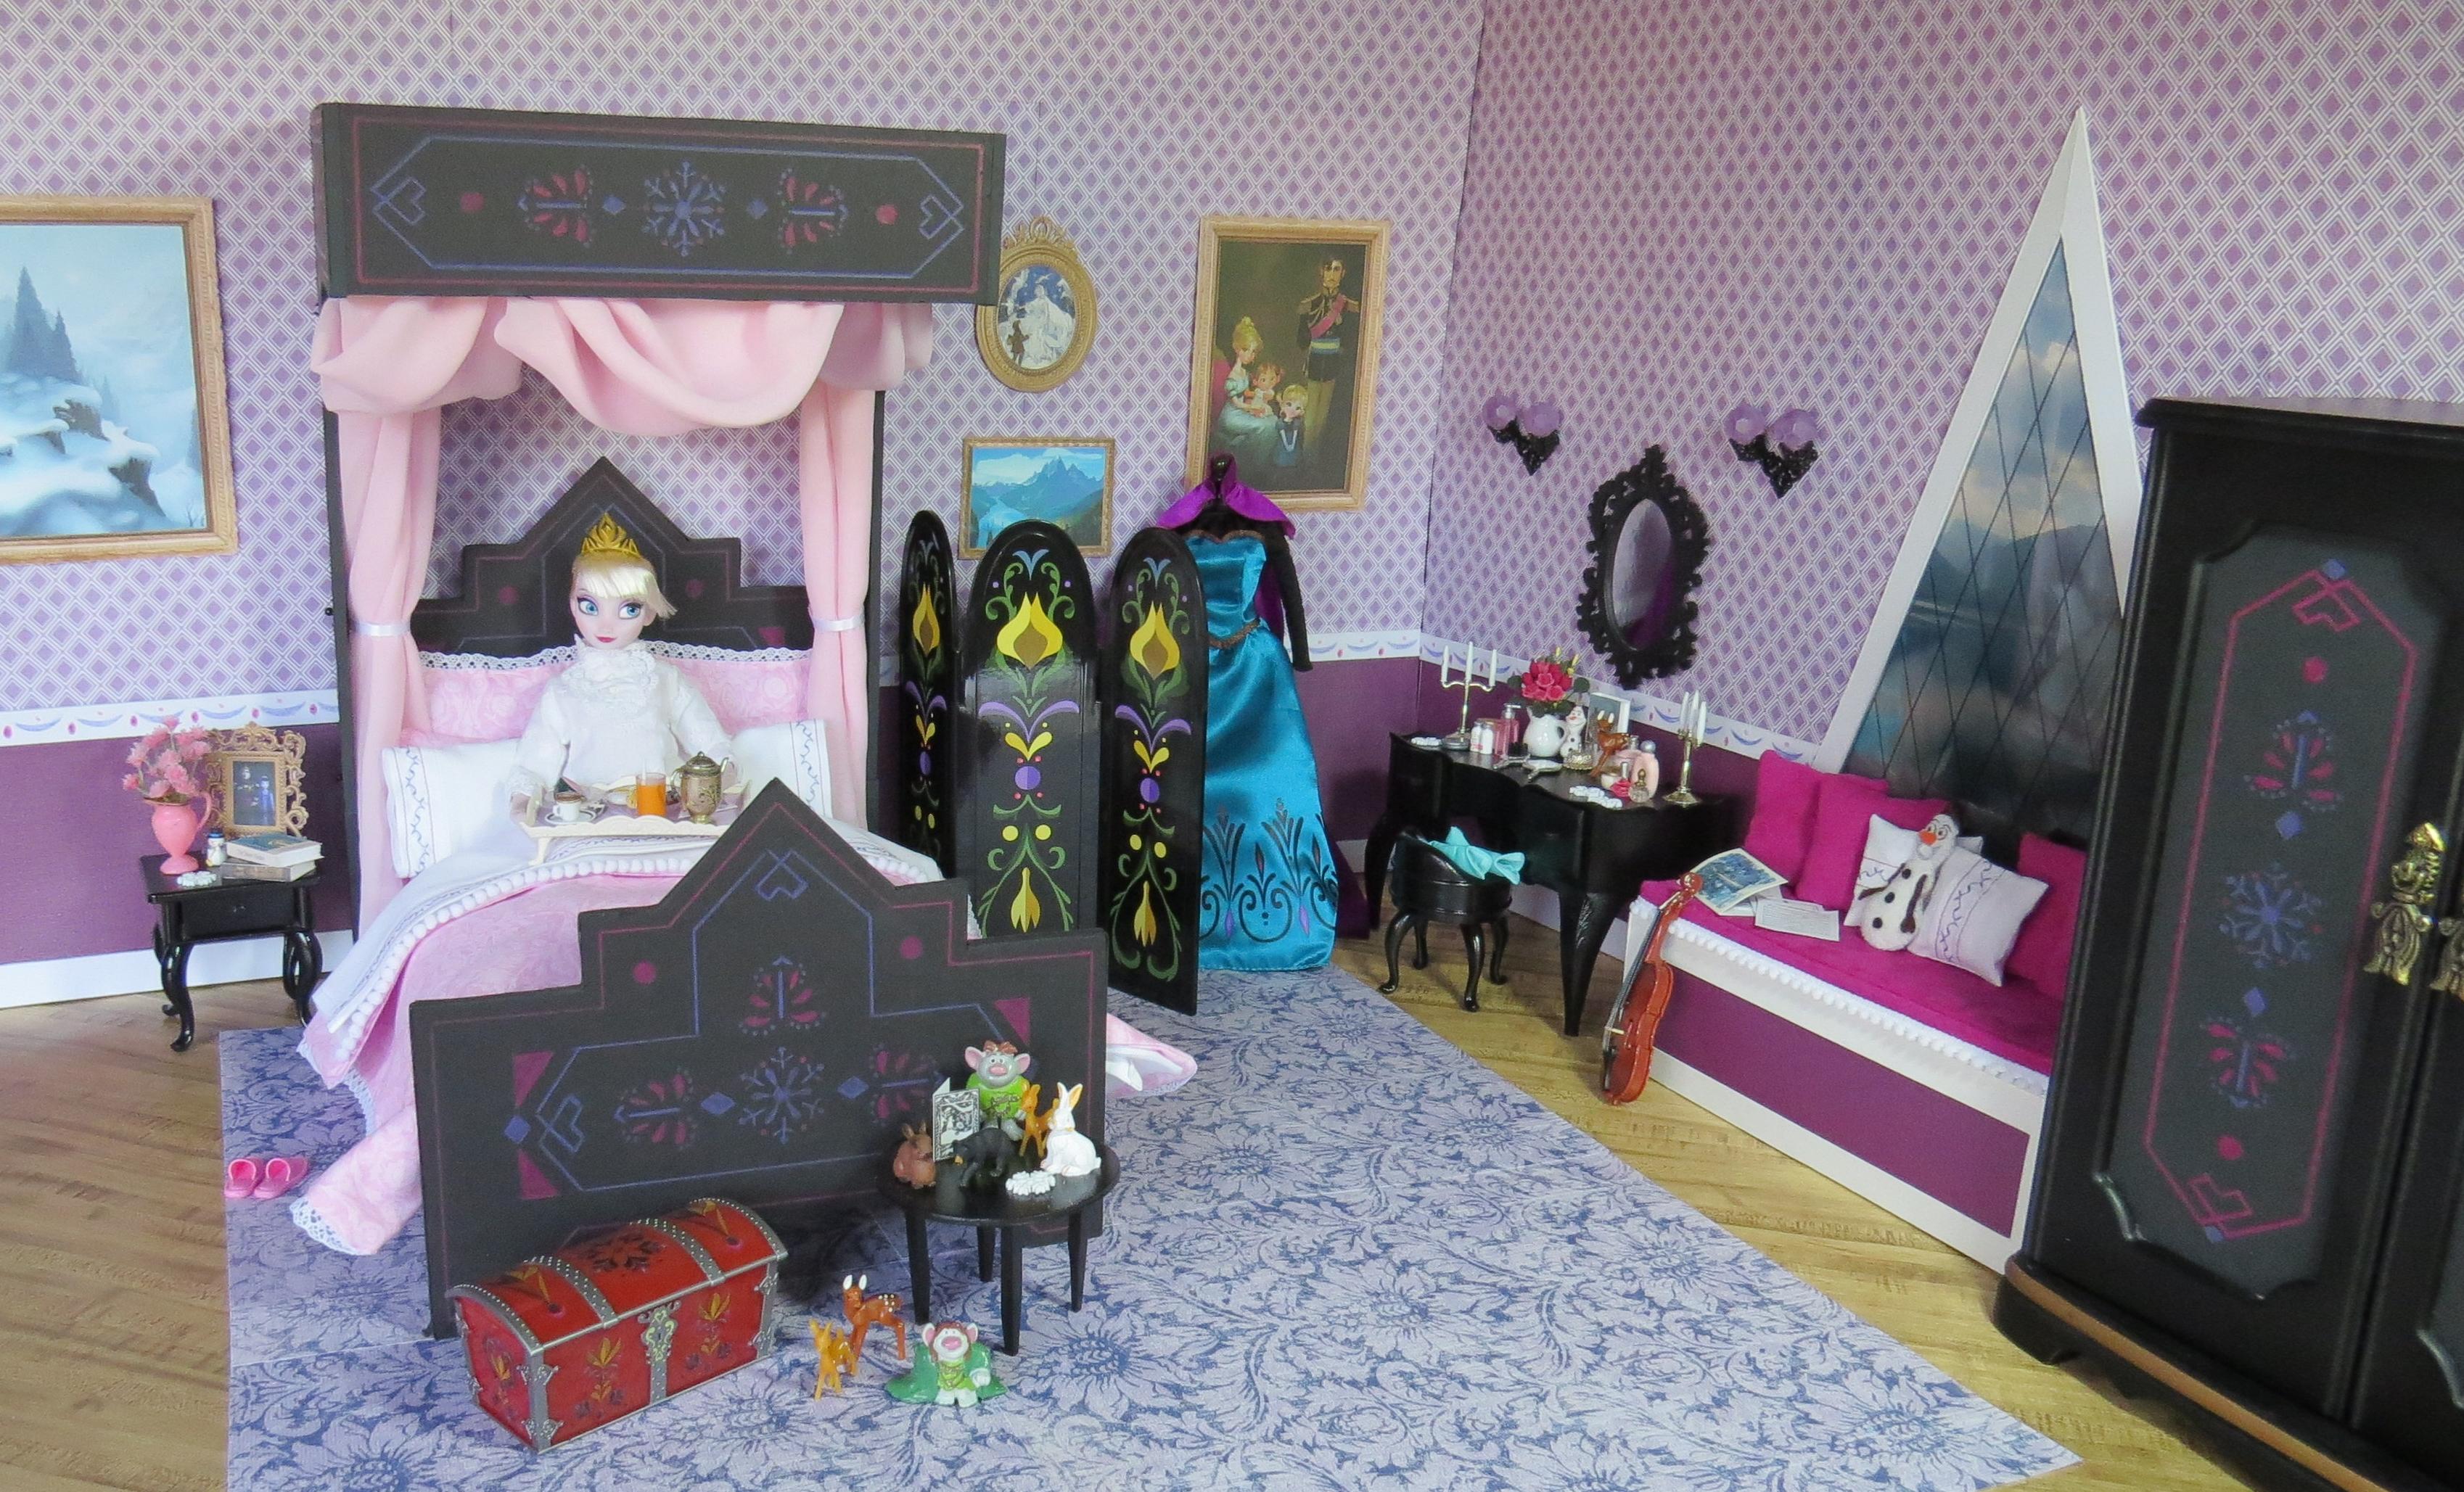 Letto Carrozza Disney : Letto disney. awesome trapunta letto walt disney with letto disney